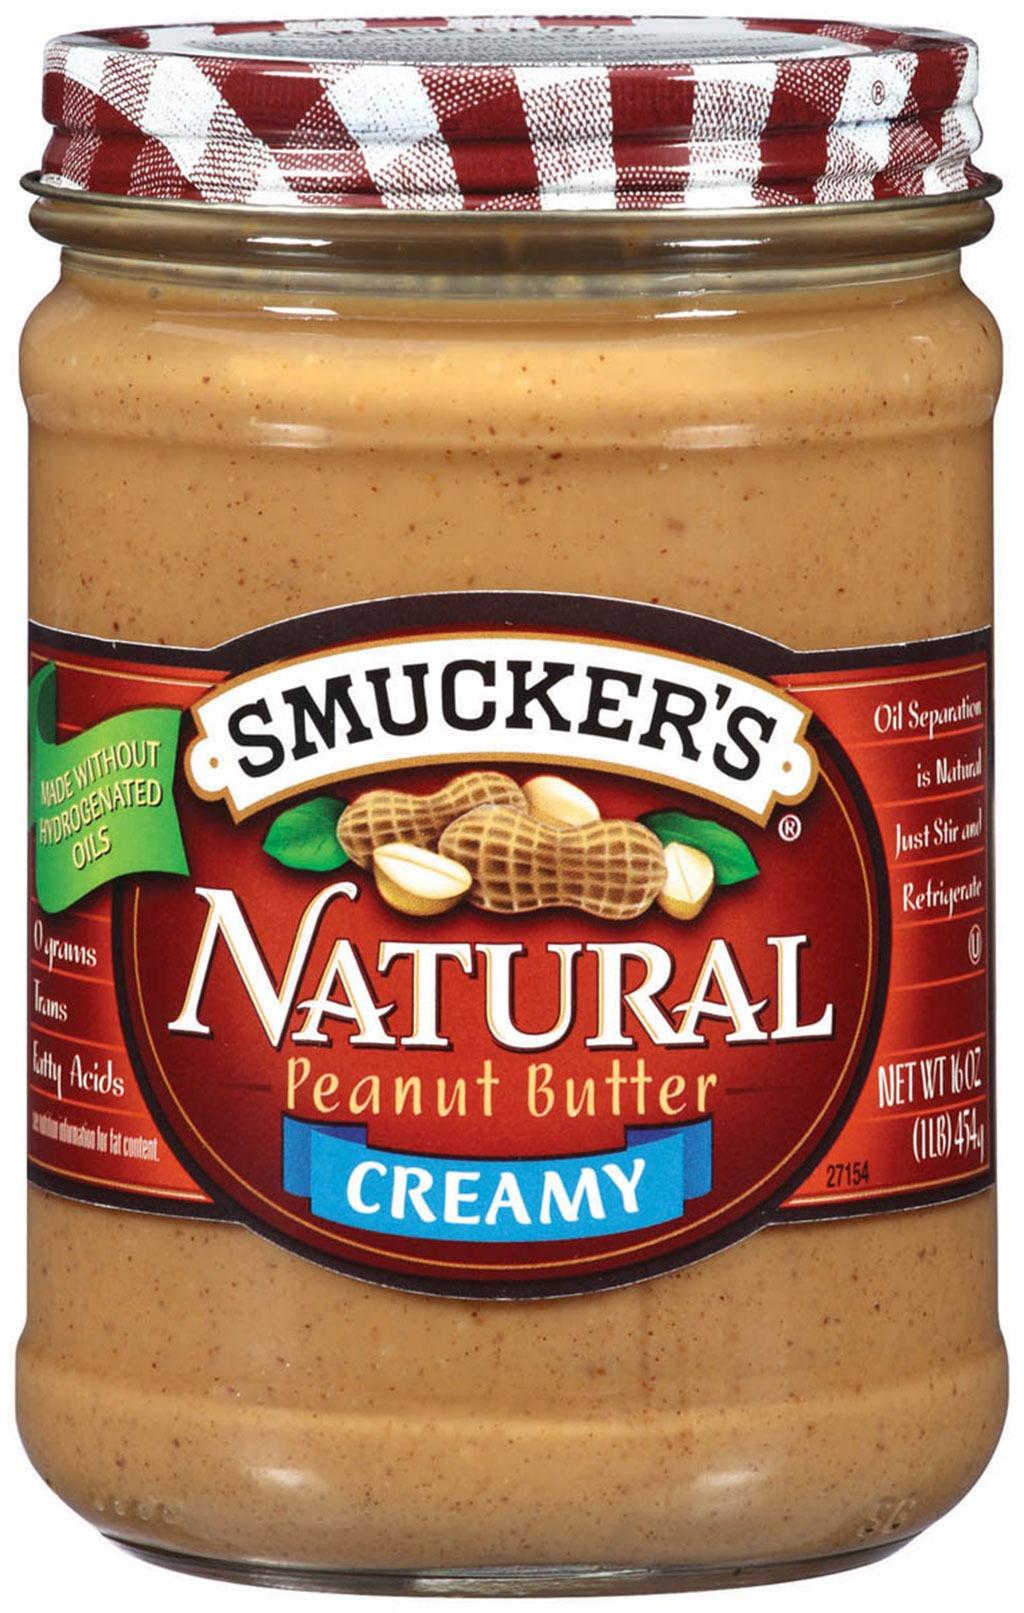 Peanut Butter Backgrounds on Wallpapers Vista